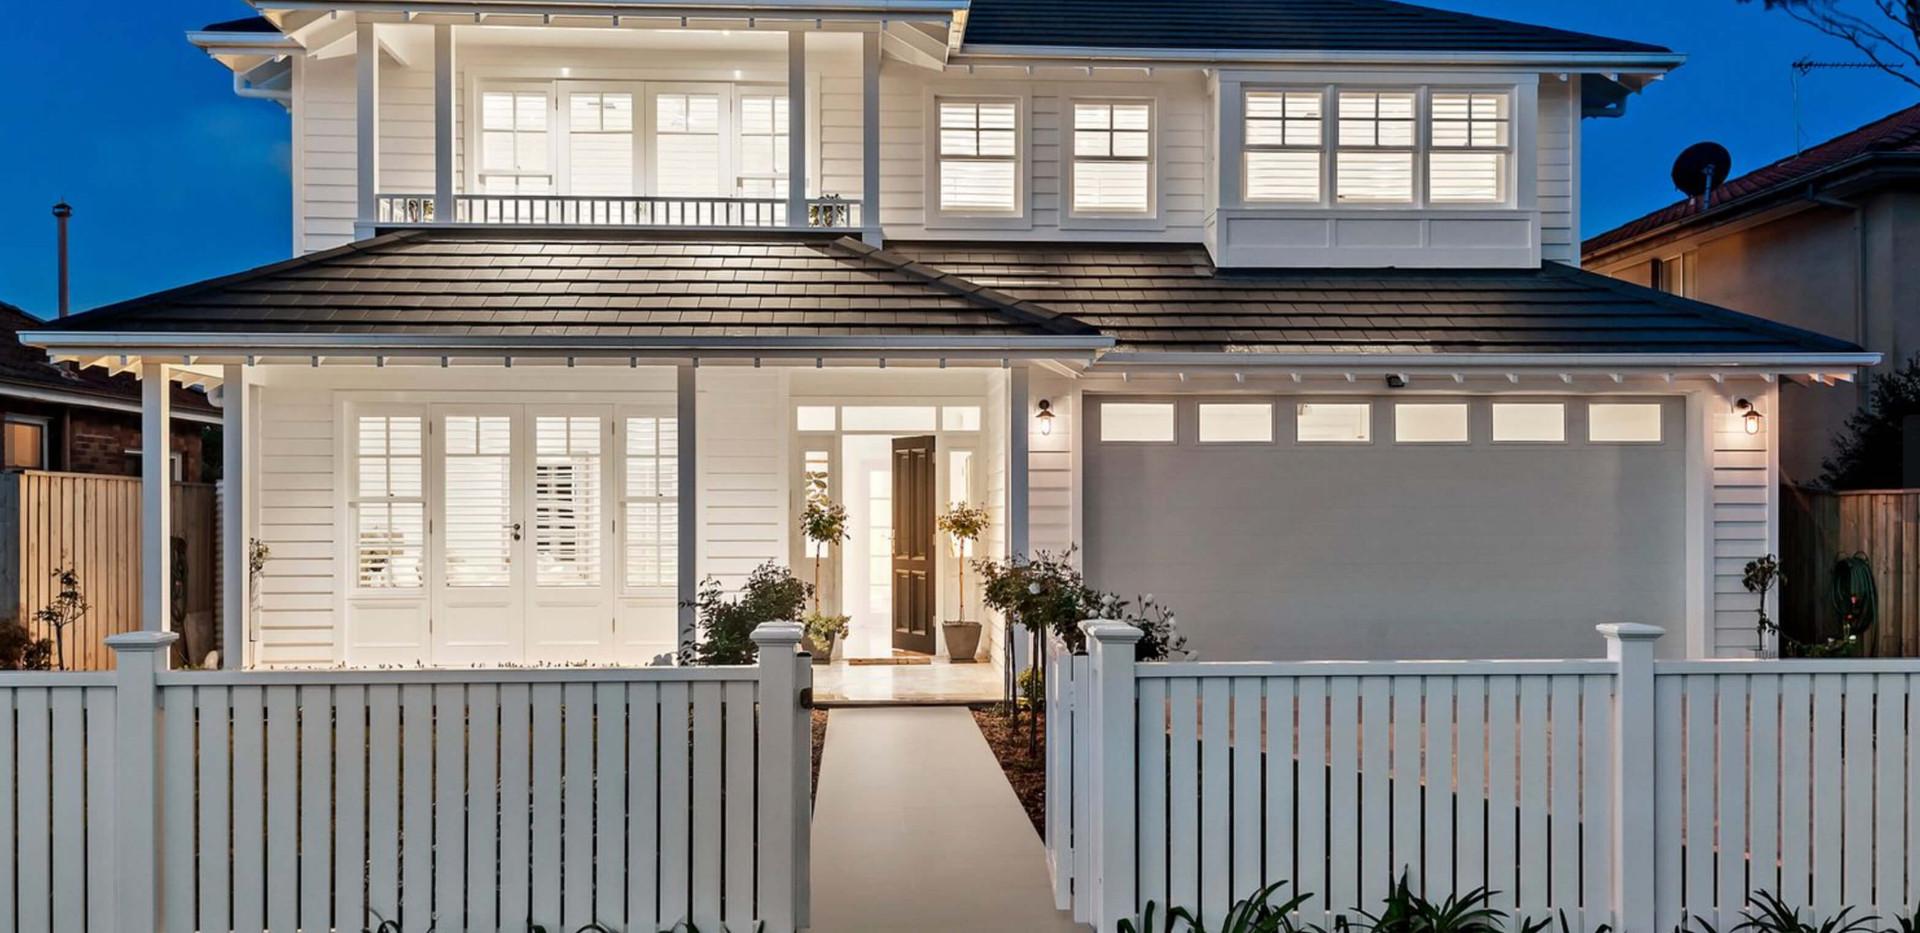 Seaforth Hamptons House - Residential exterior design